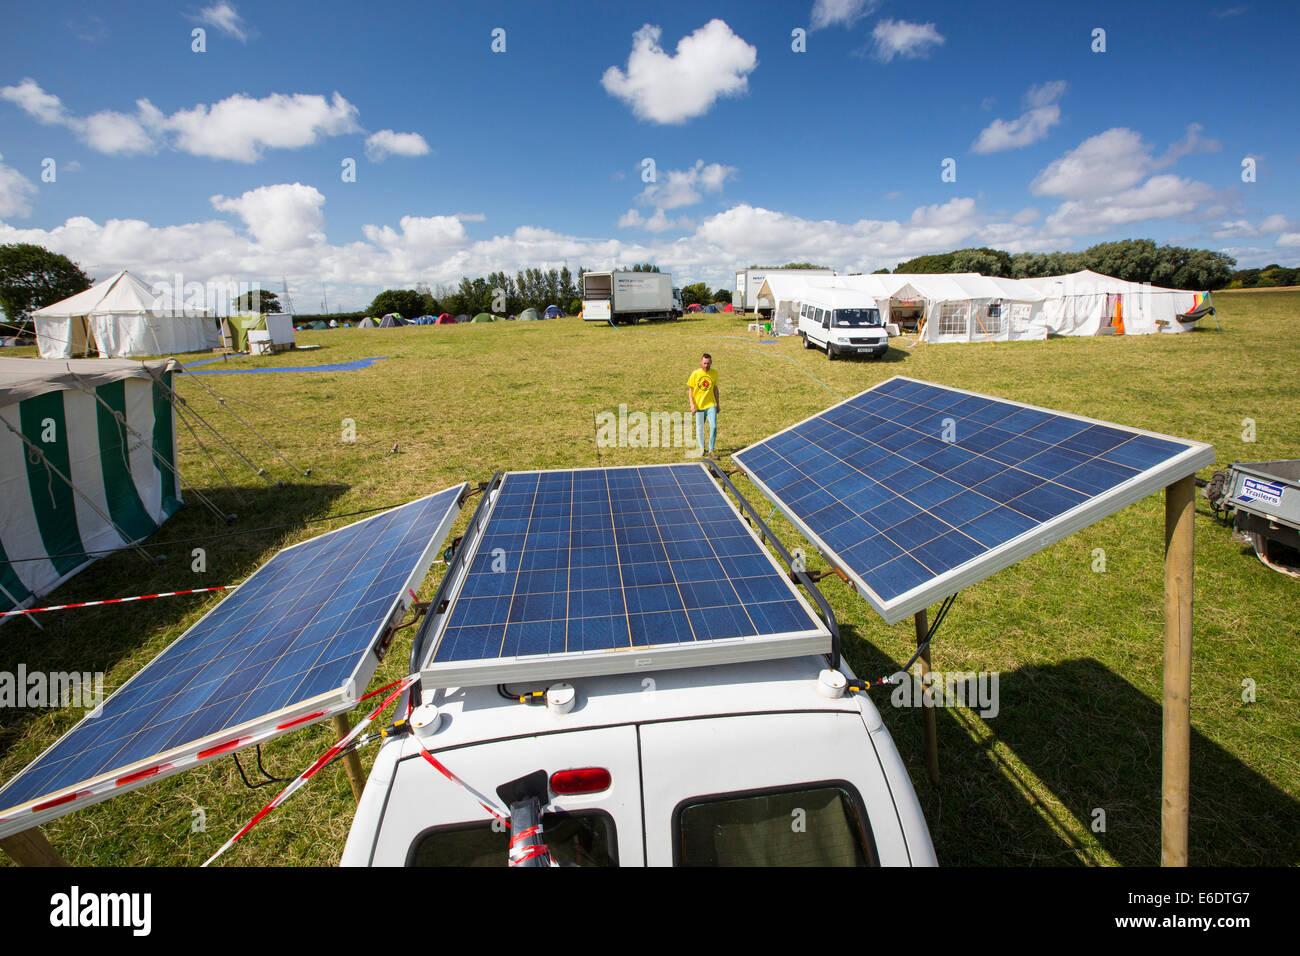 Solar Panel Tent Stock Photos Amp Solar Panel Tent Stock